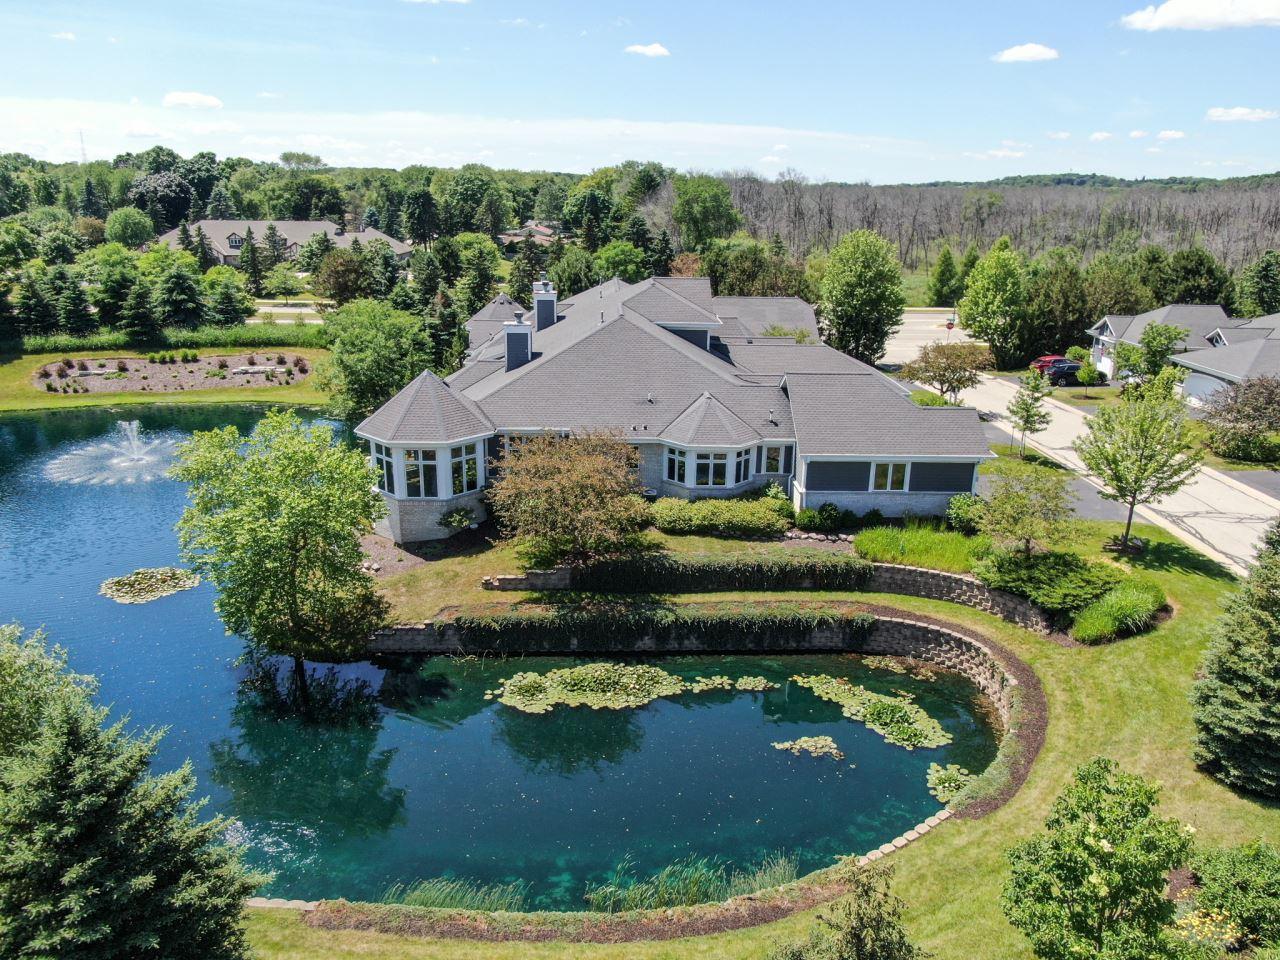 17155 Lake Rd #A, Brookfield, WI 53005 - #: 1695910